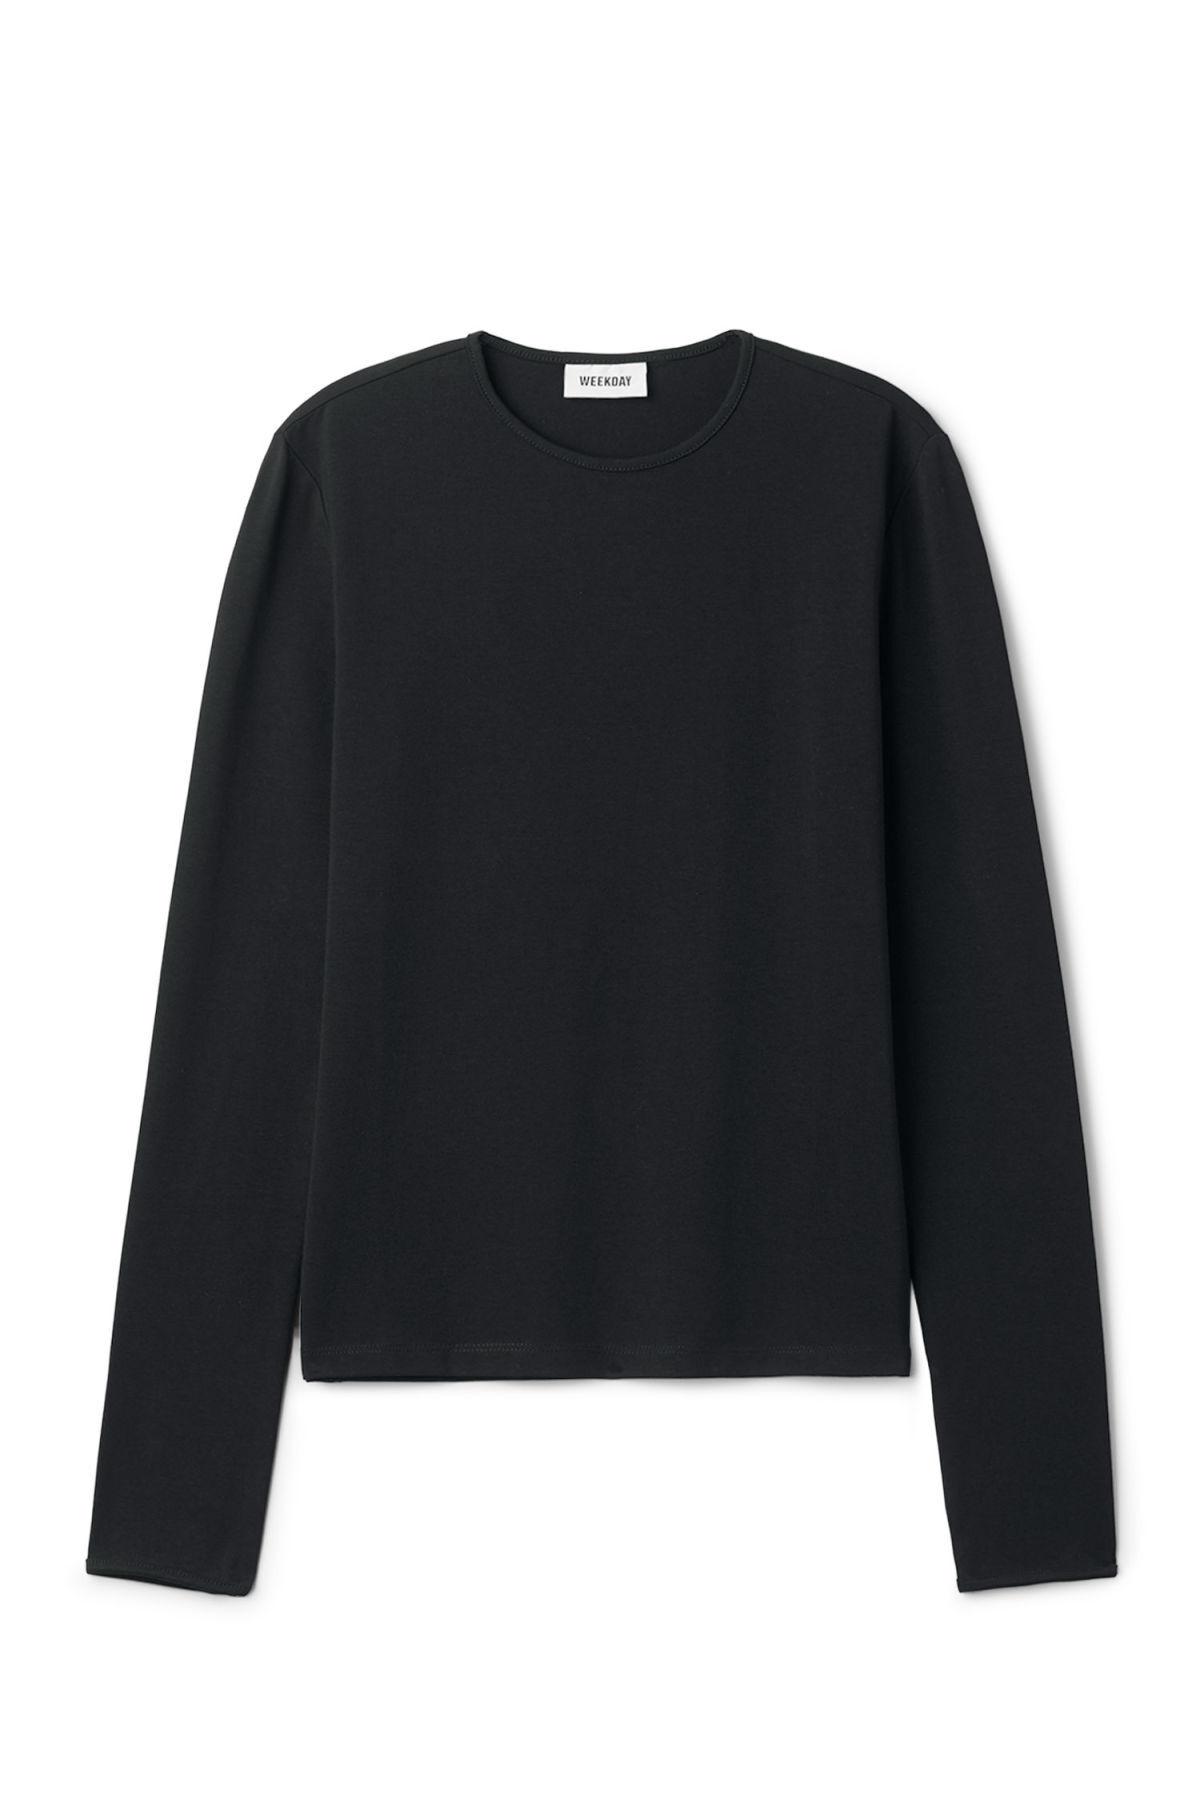 Image of Hue Long Sleeve - Black-XS